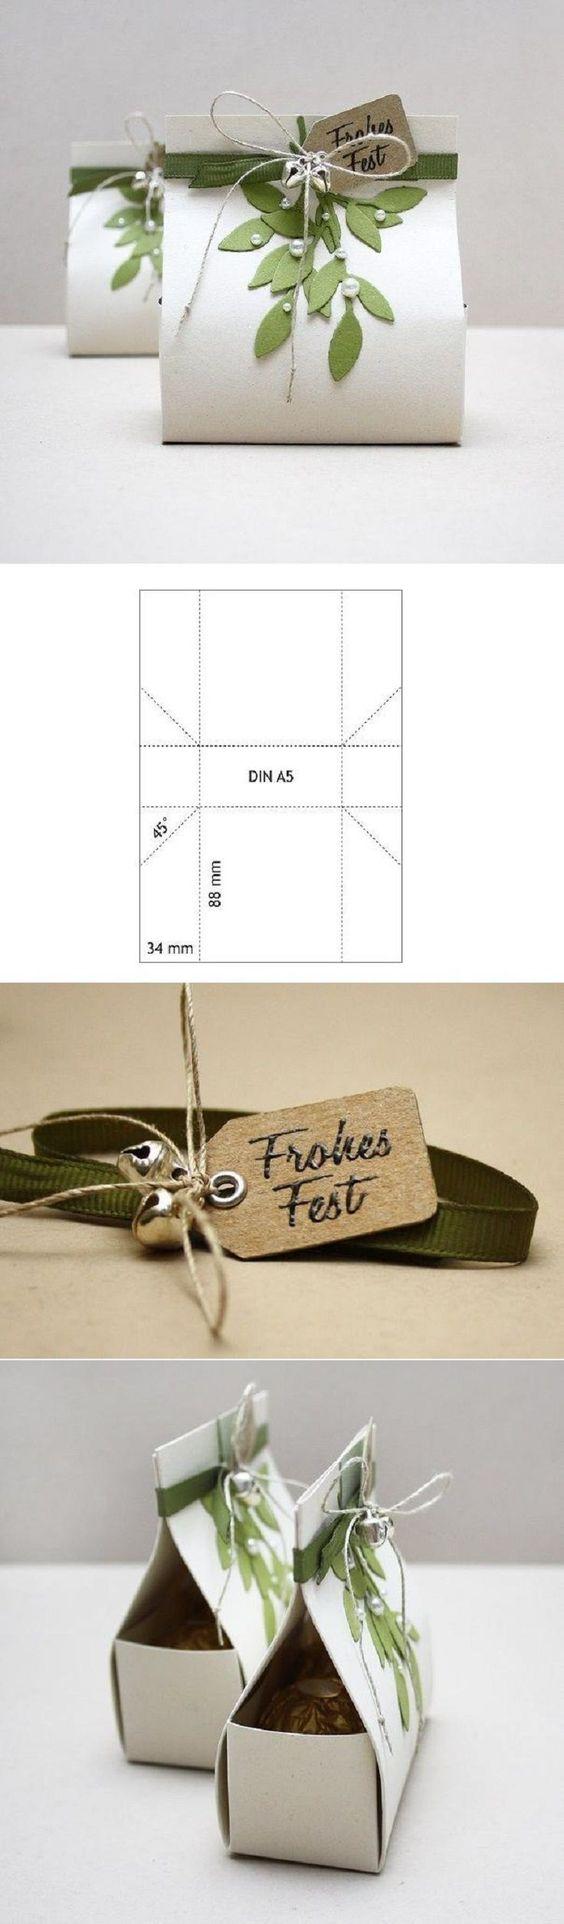 Plantilla para packaging